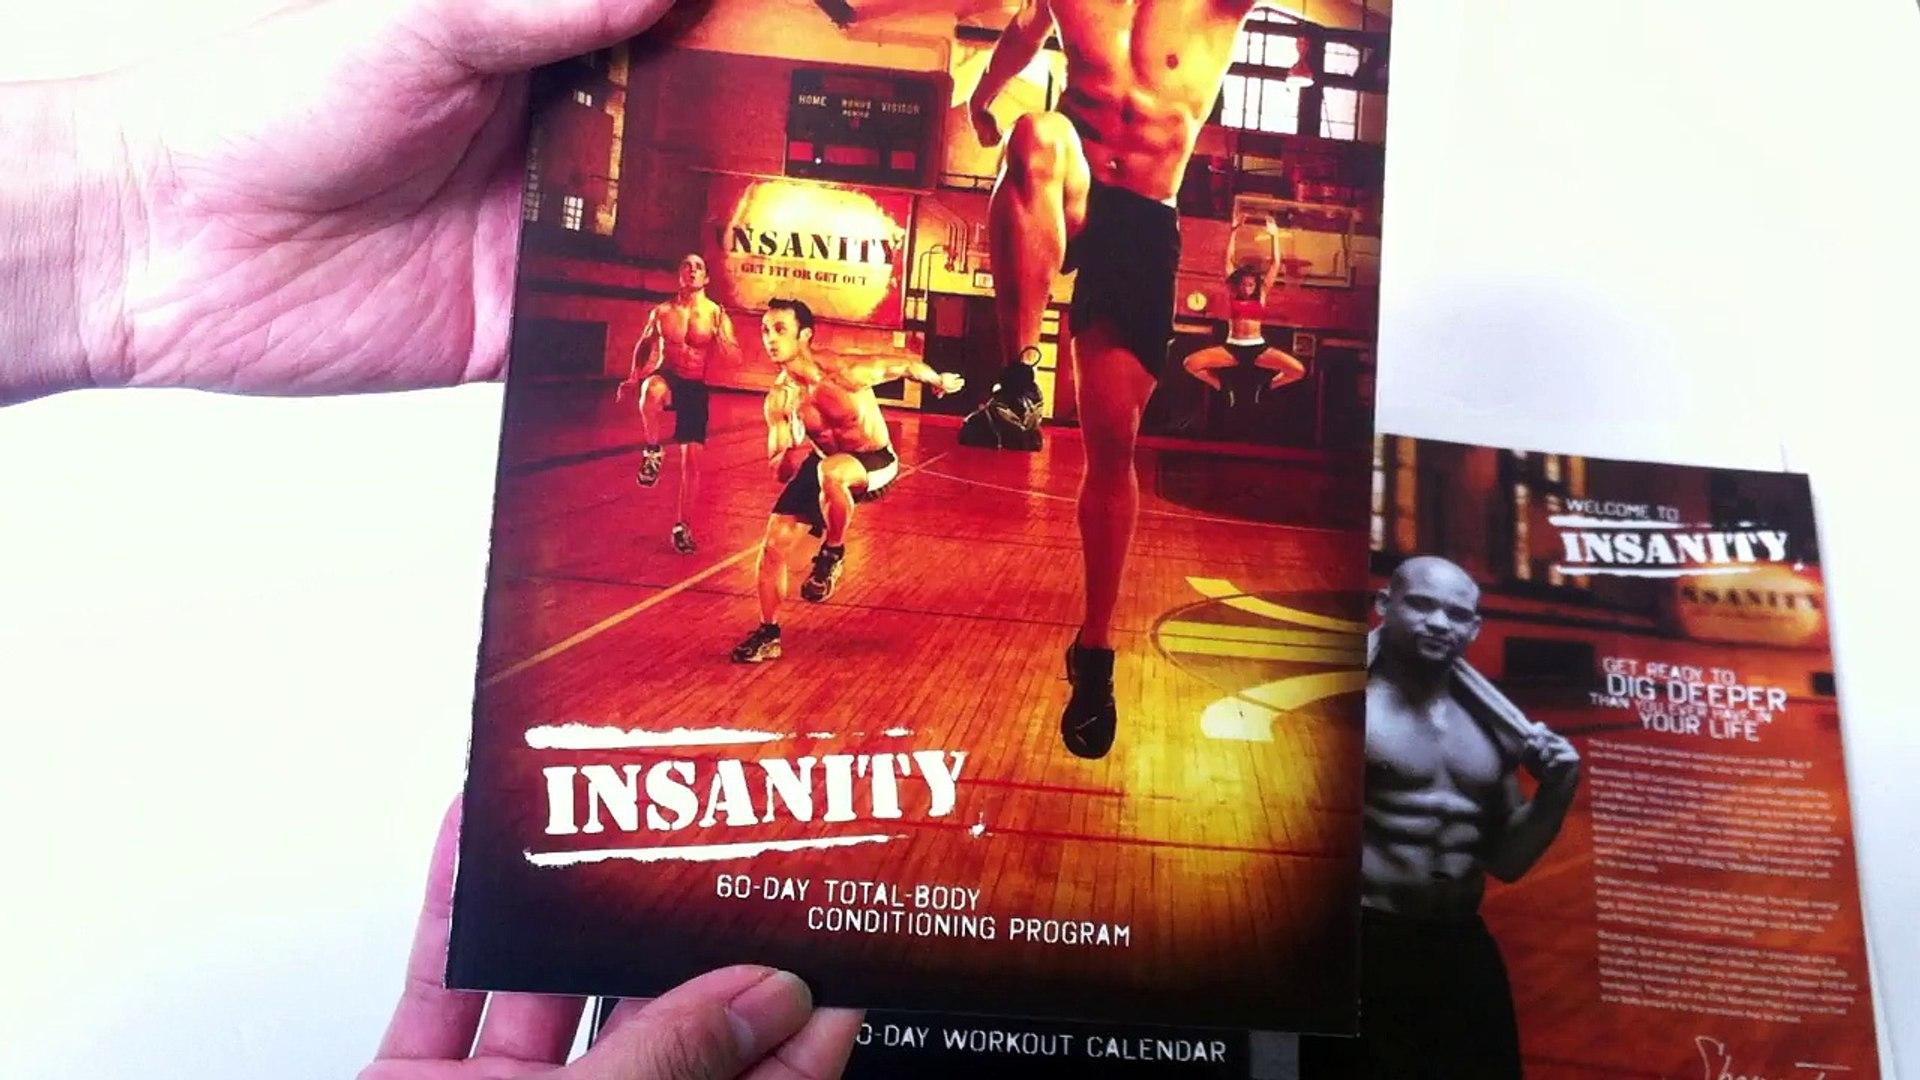 Insanity Workout 10 DVD